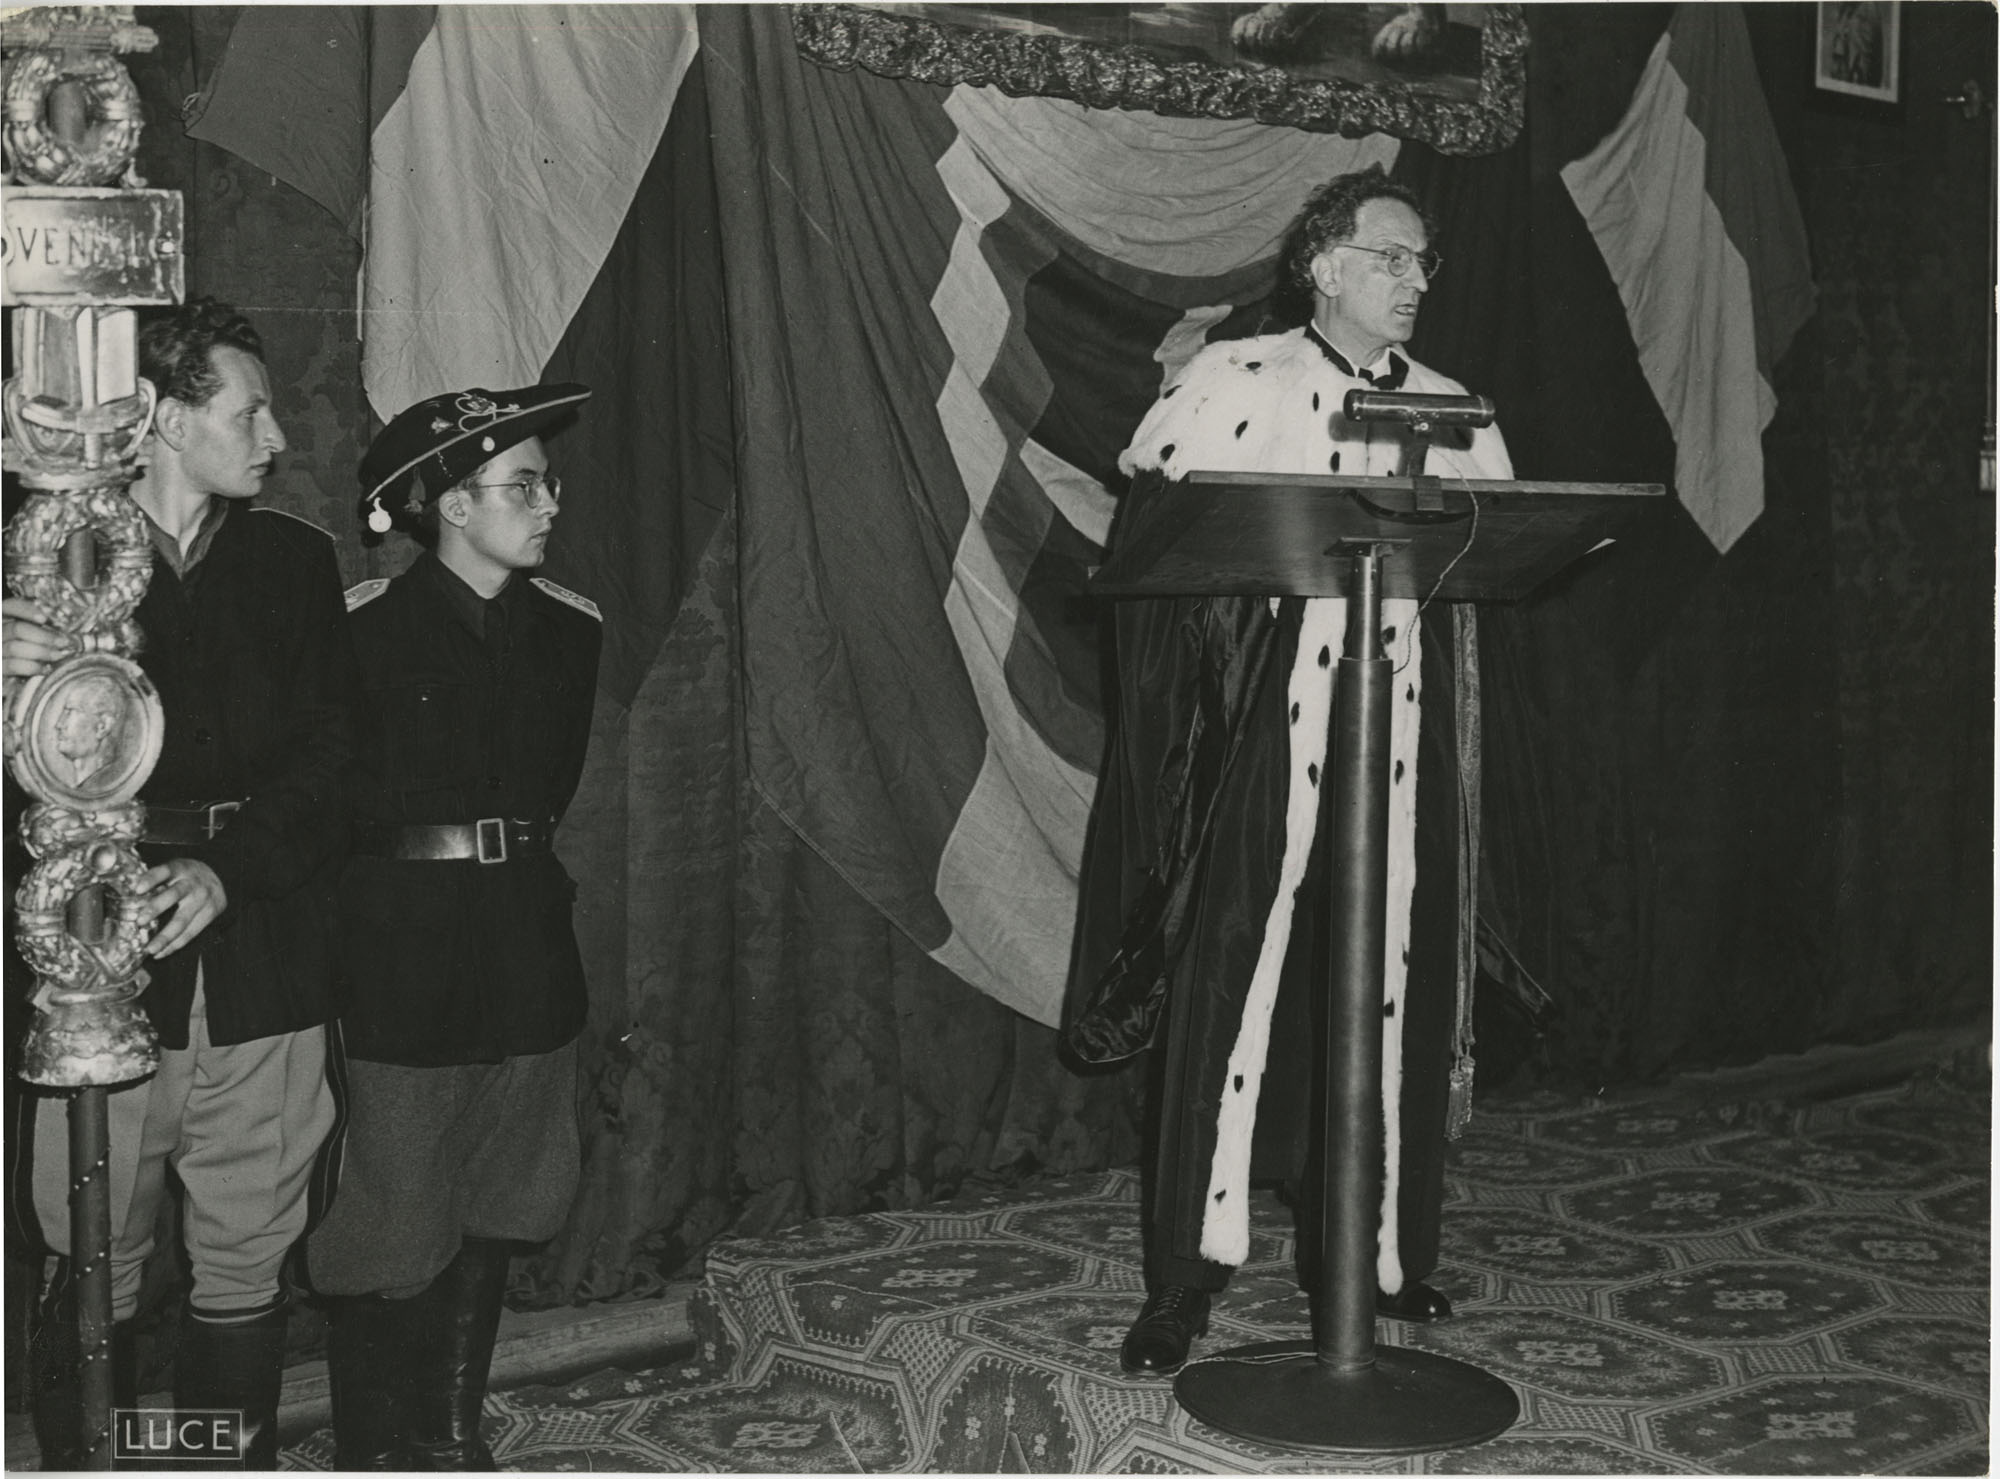 Mihai Antonescu's visit to Benito Mussolini, Photograph 20